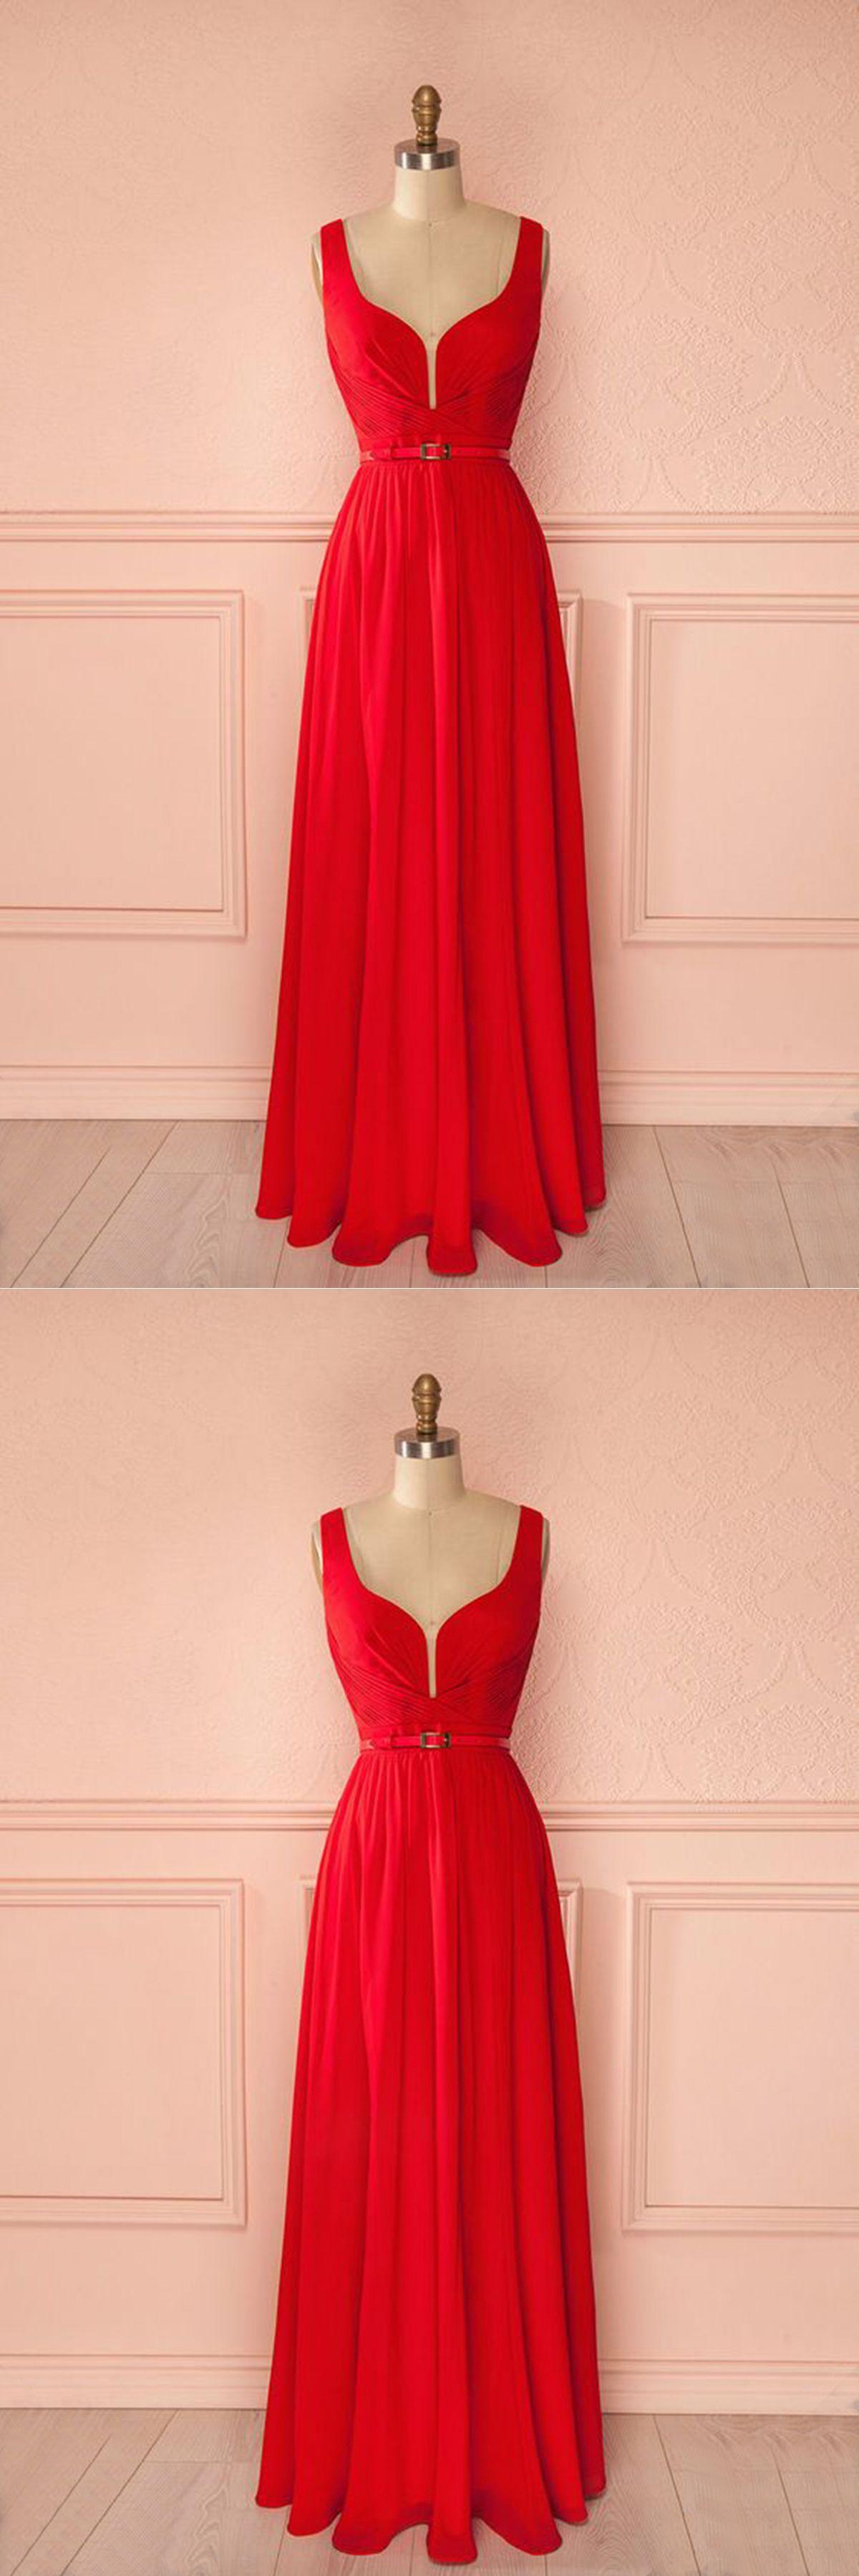 Simple red chiffon v neck floor length halter prom dress long